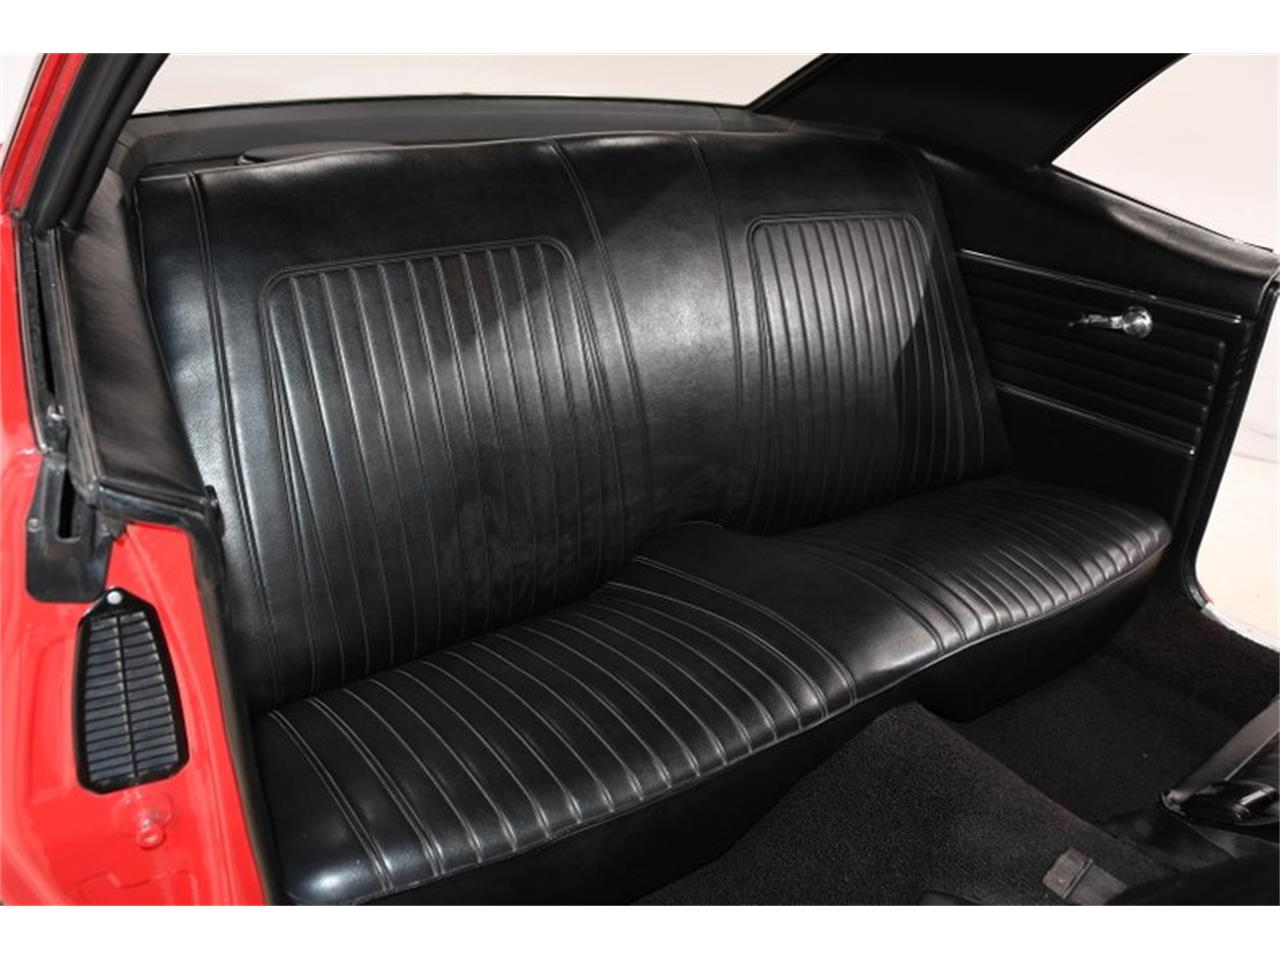 Large Picture of 1968 Chevrolet Camaro located in Illinois - $31,998.00 - Q2WA